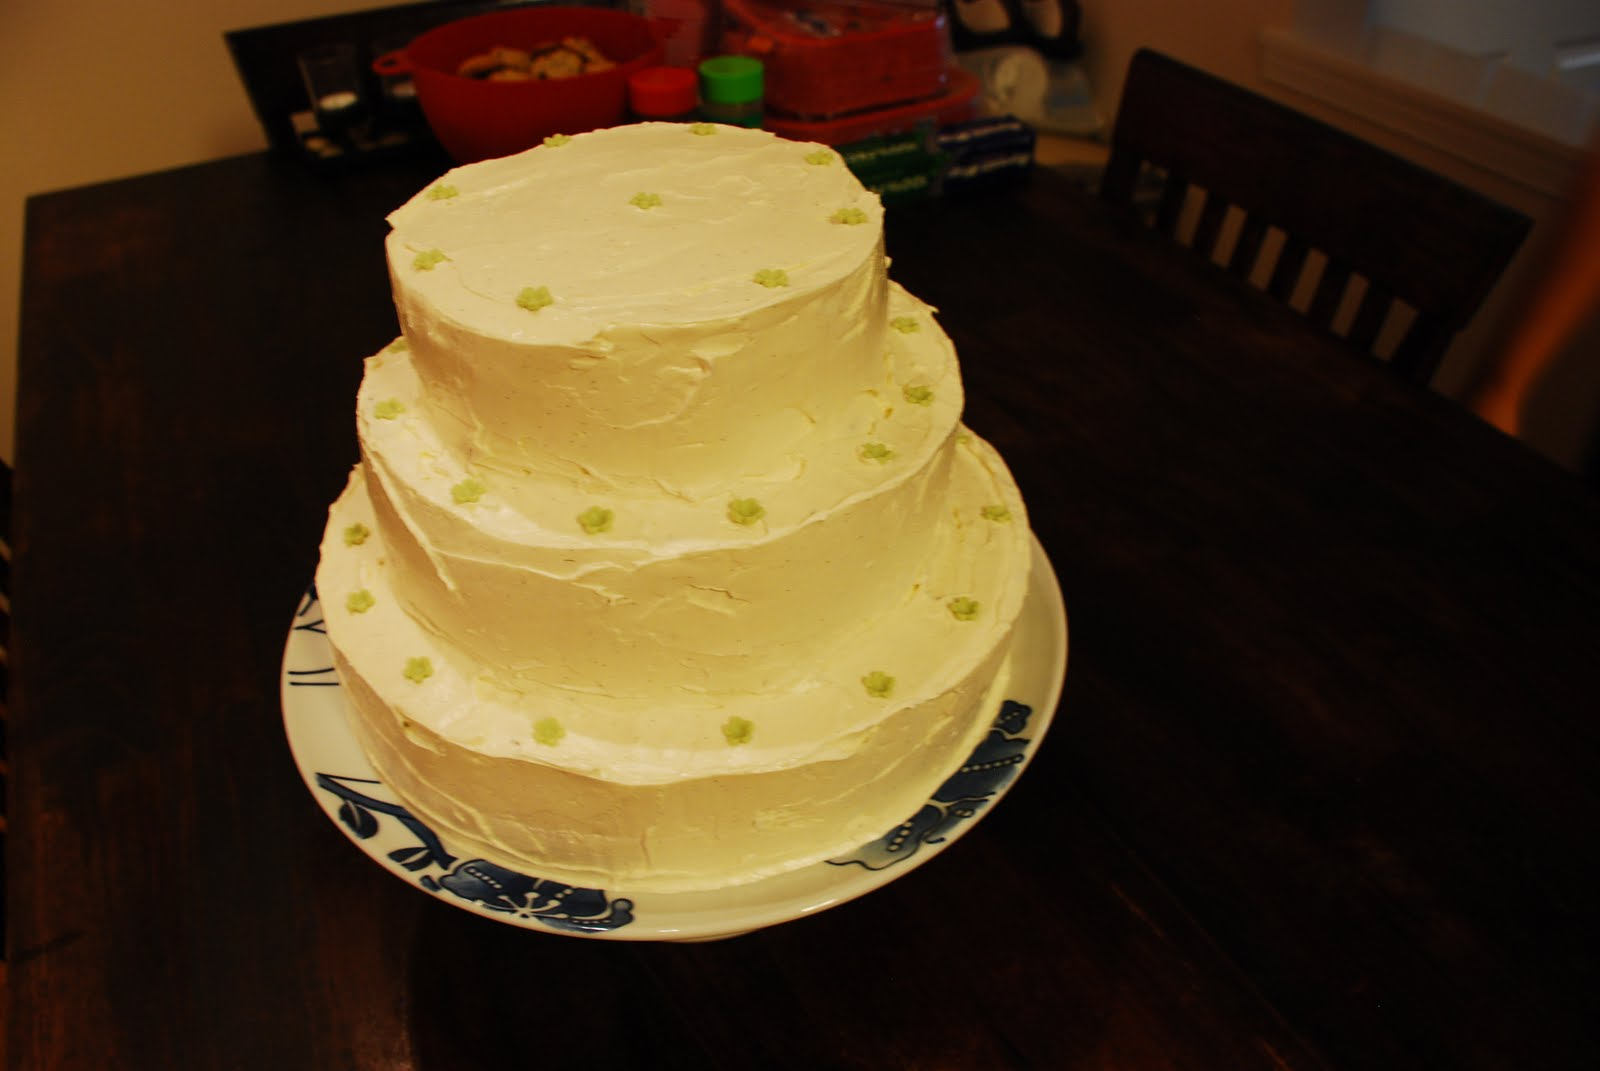 The Js wedding cake,